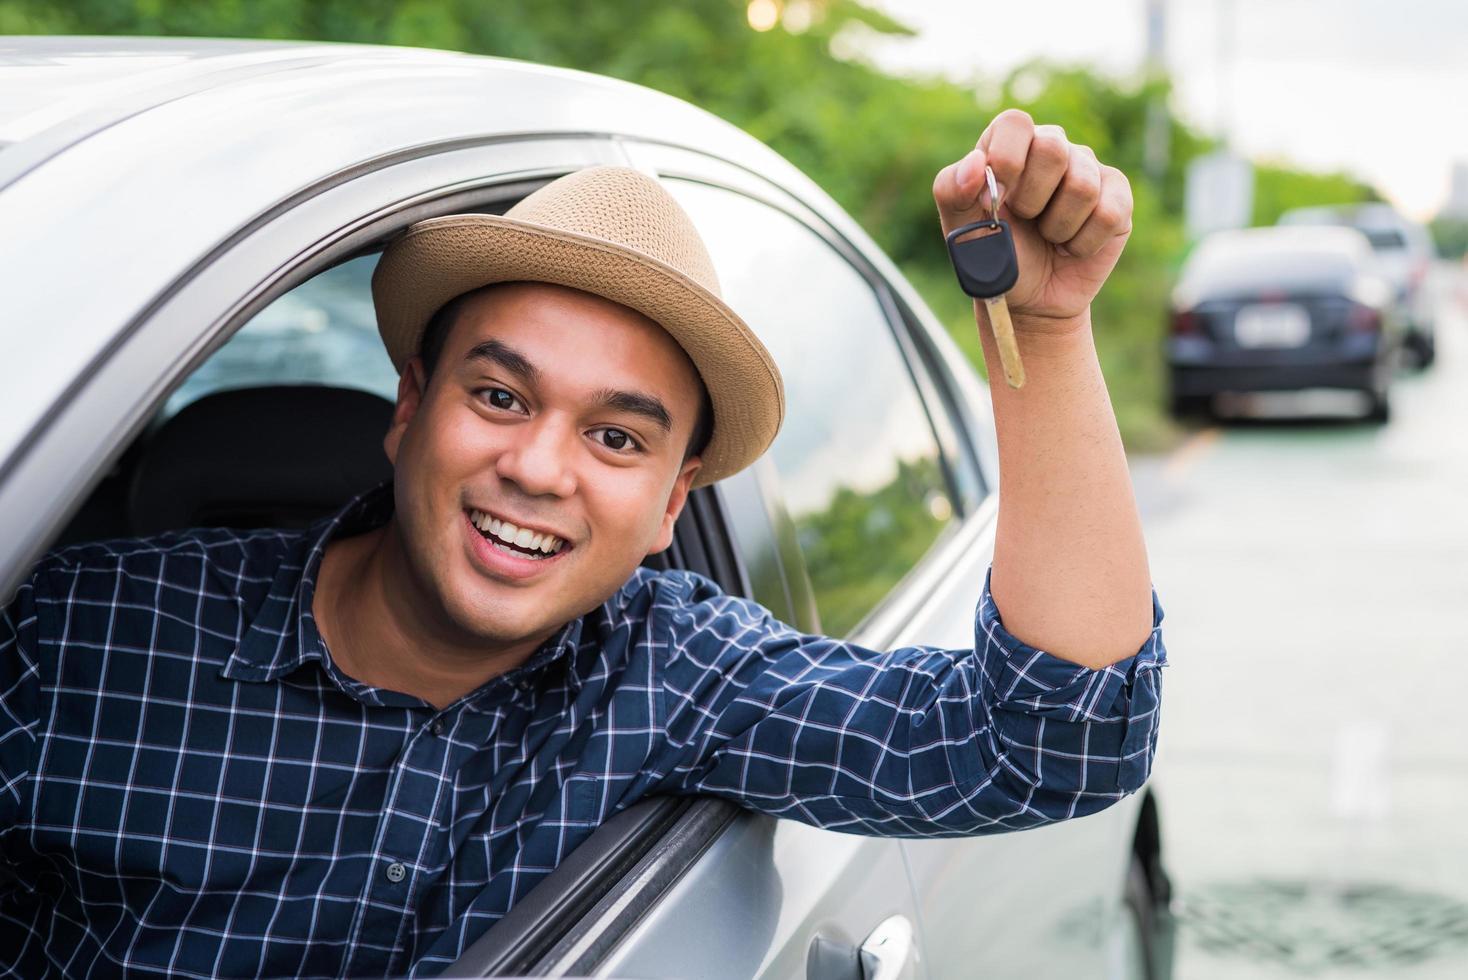 Man holding car keys from car window photo